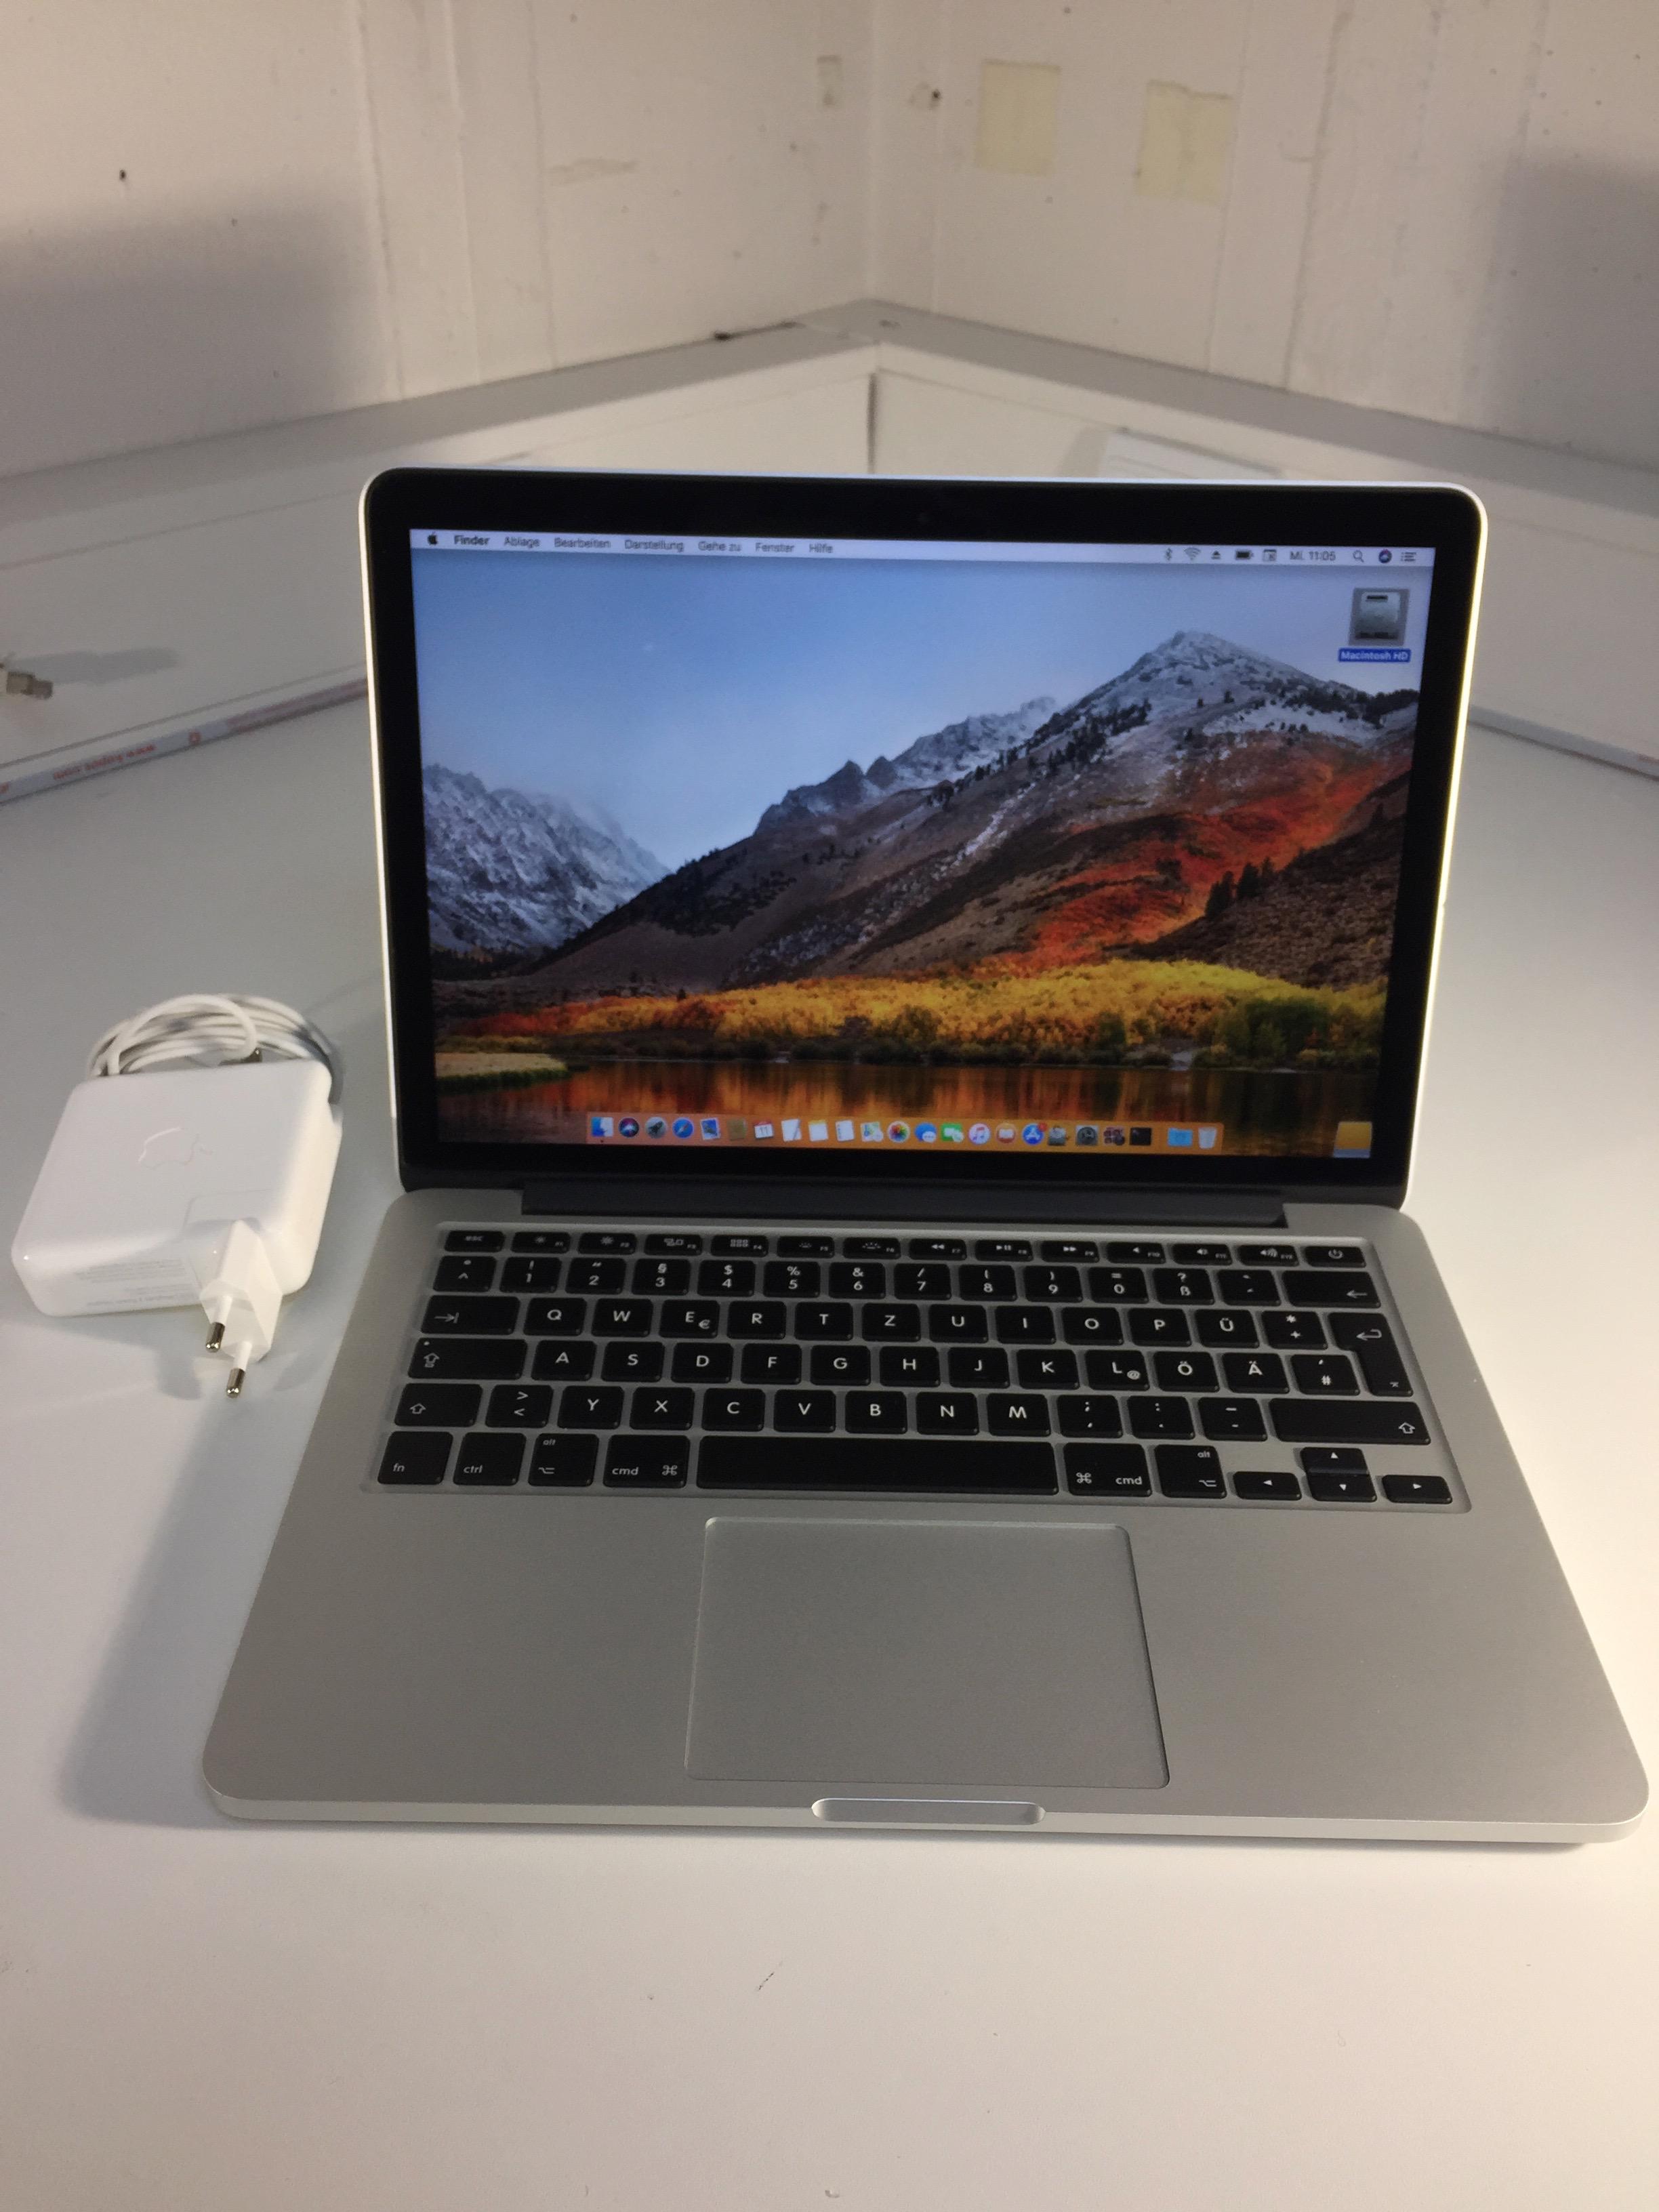 MacBook Pro 13-inch Retina, 2.6 GHz Intel Core i5, 16 GB, 128 GB Flash, Bild 2